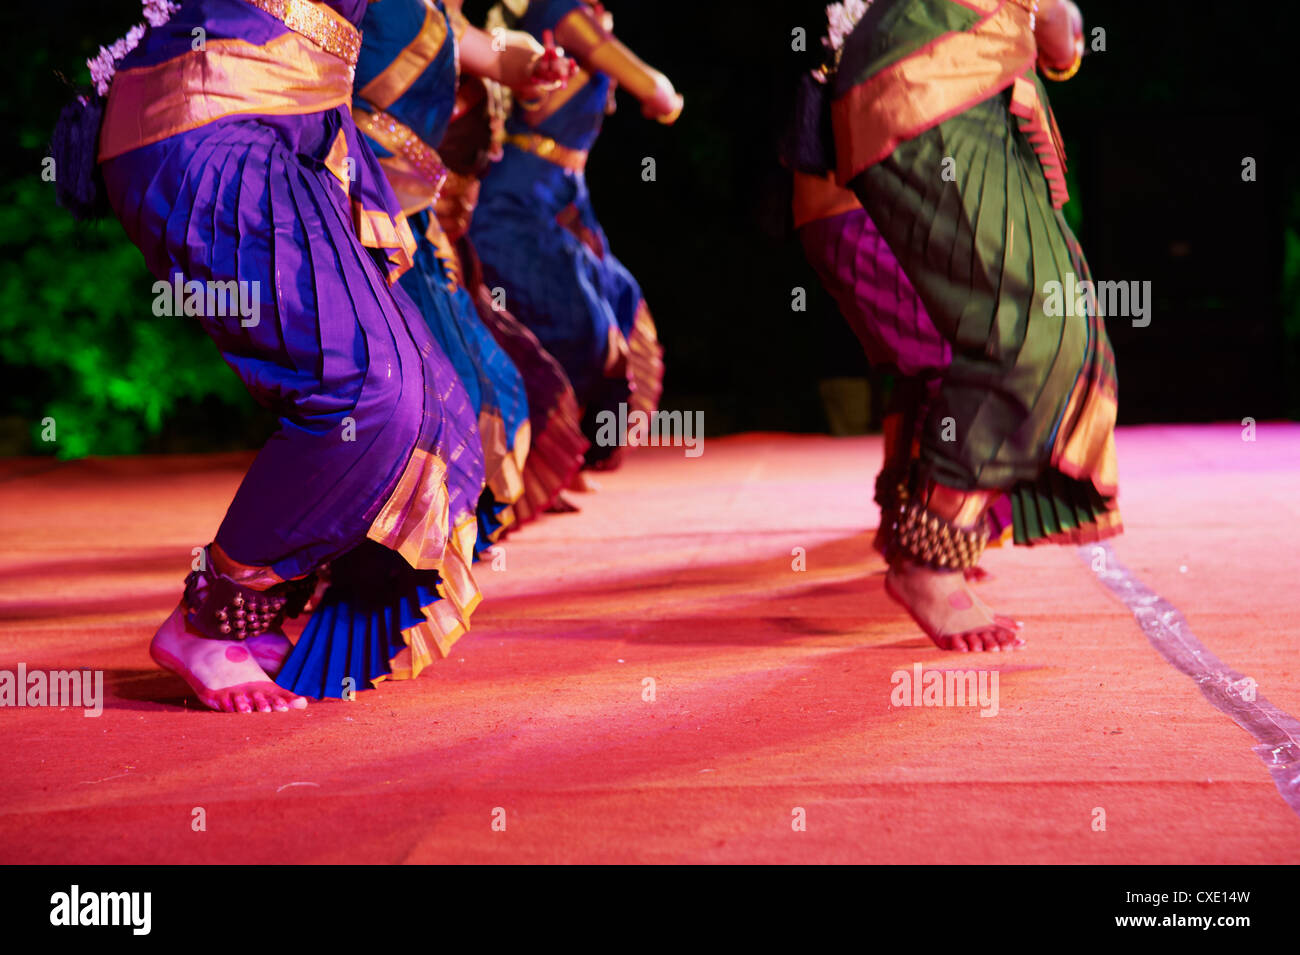 Women dancers, Indian traditional dance festival, Mamallapuram (Mahabalipuram), Tamil Nadu, India, Asia Stock Photo